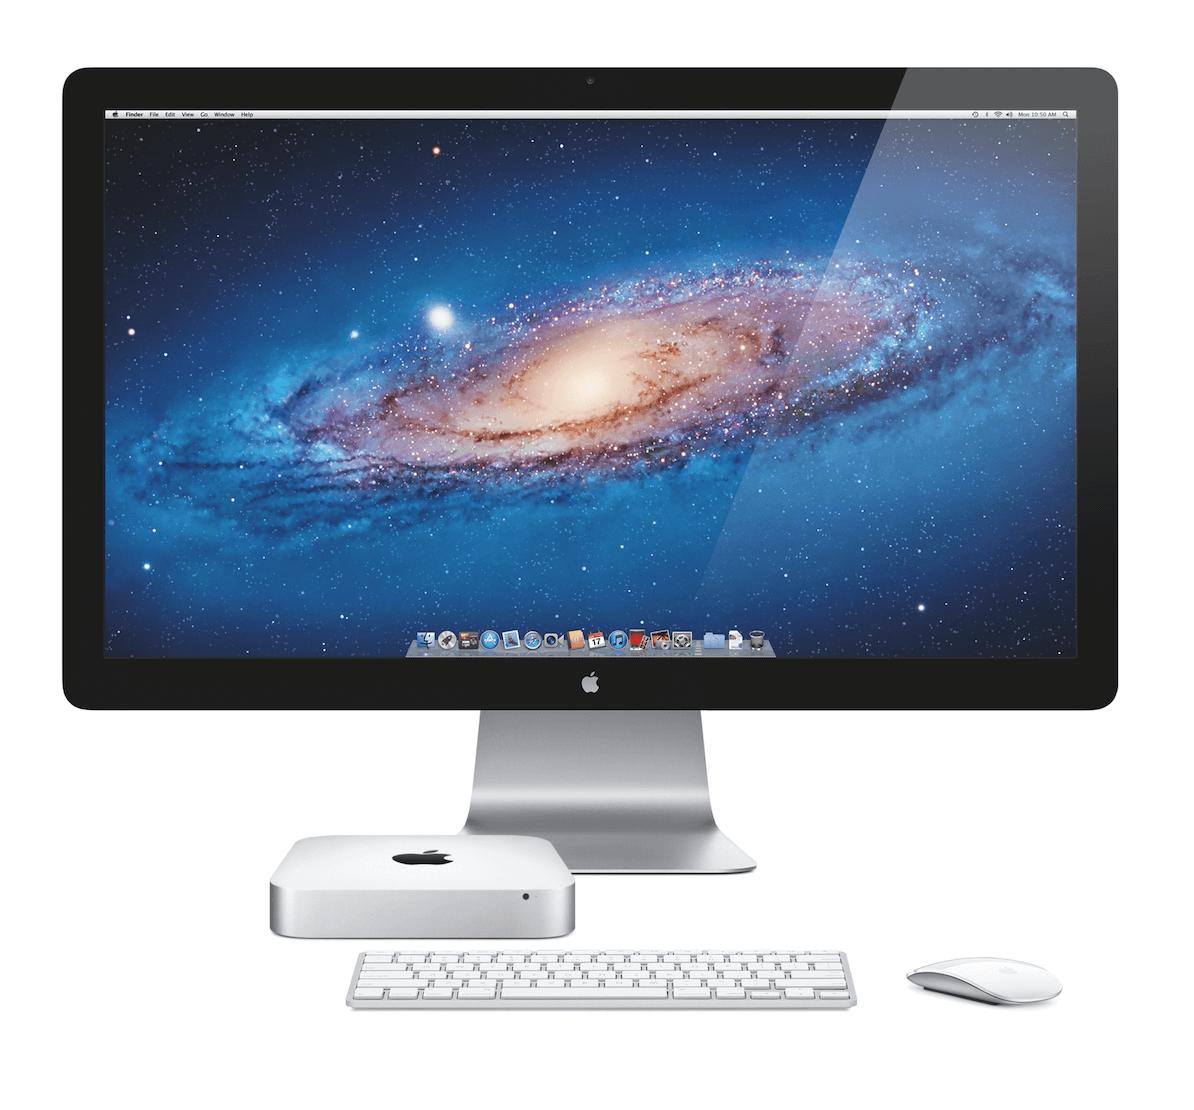 Mac mini 2014: Apple aktualisiert den Mac mini wohl demnächst 7